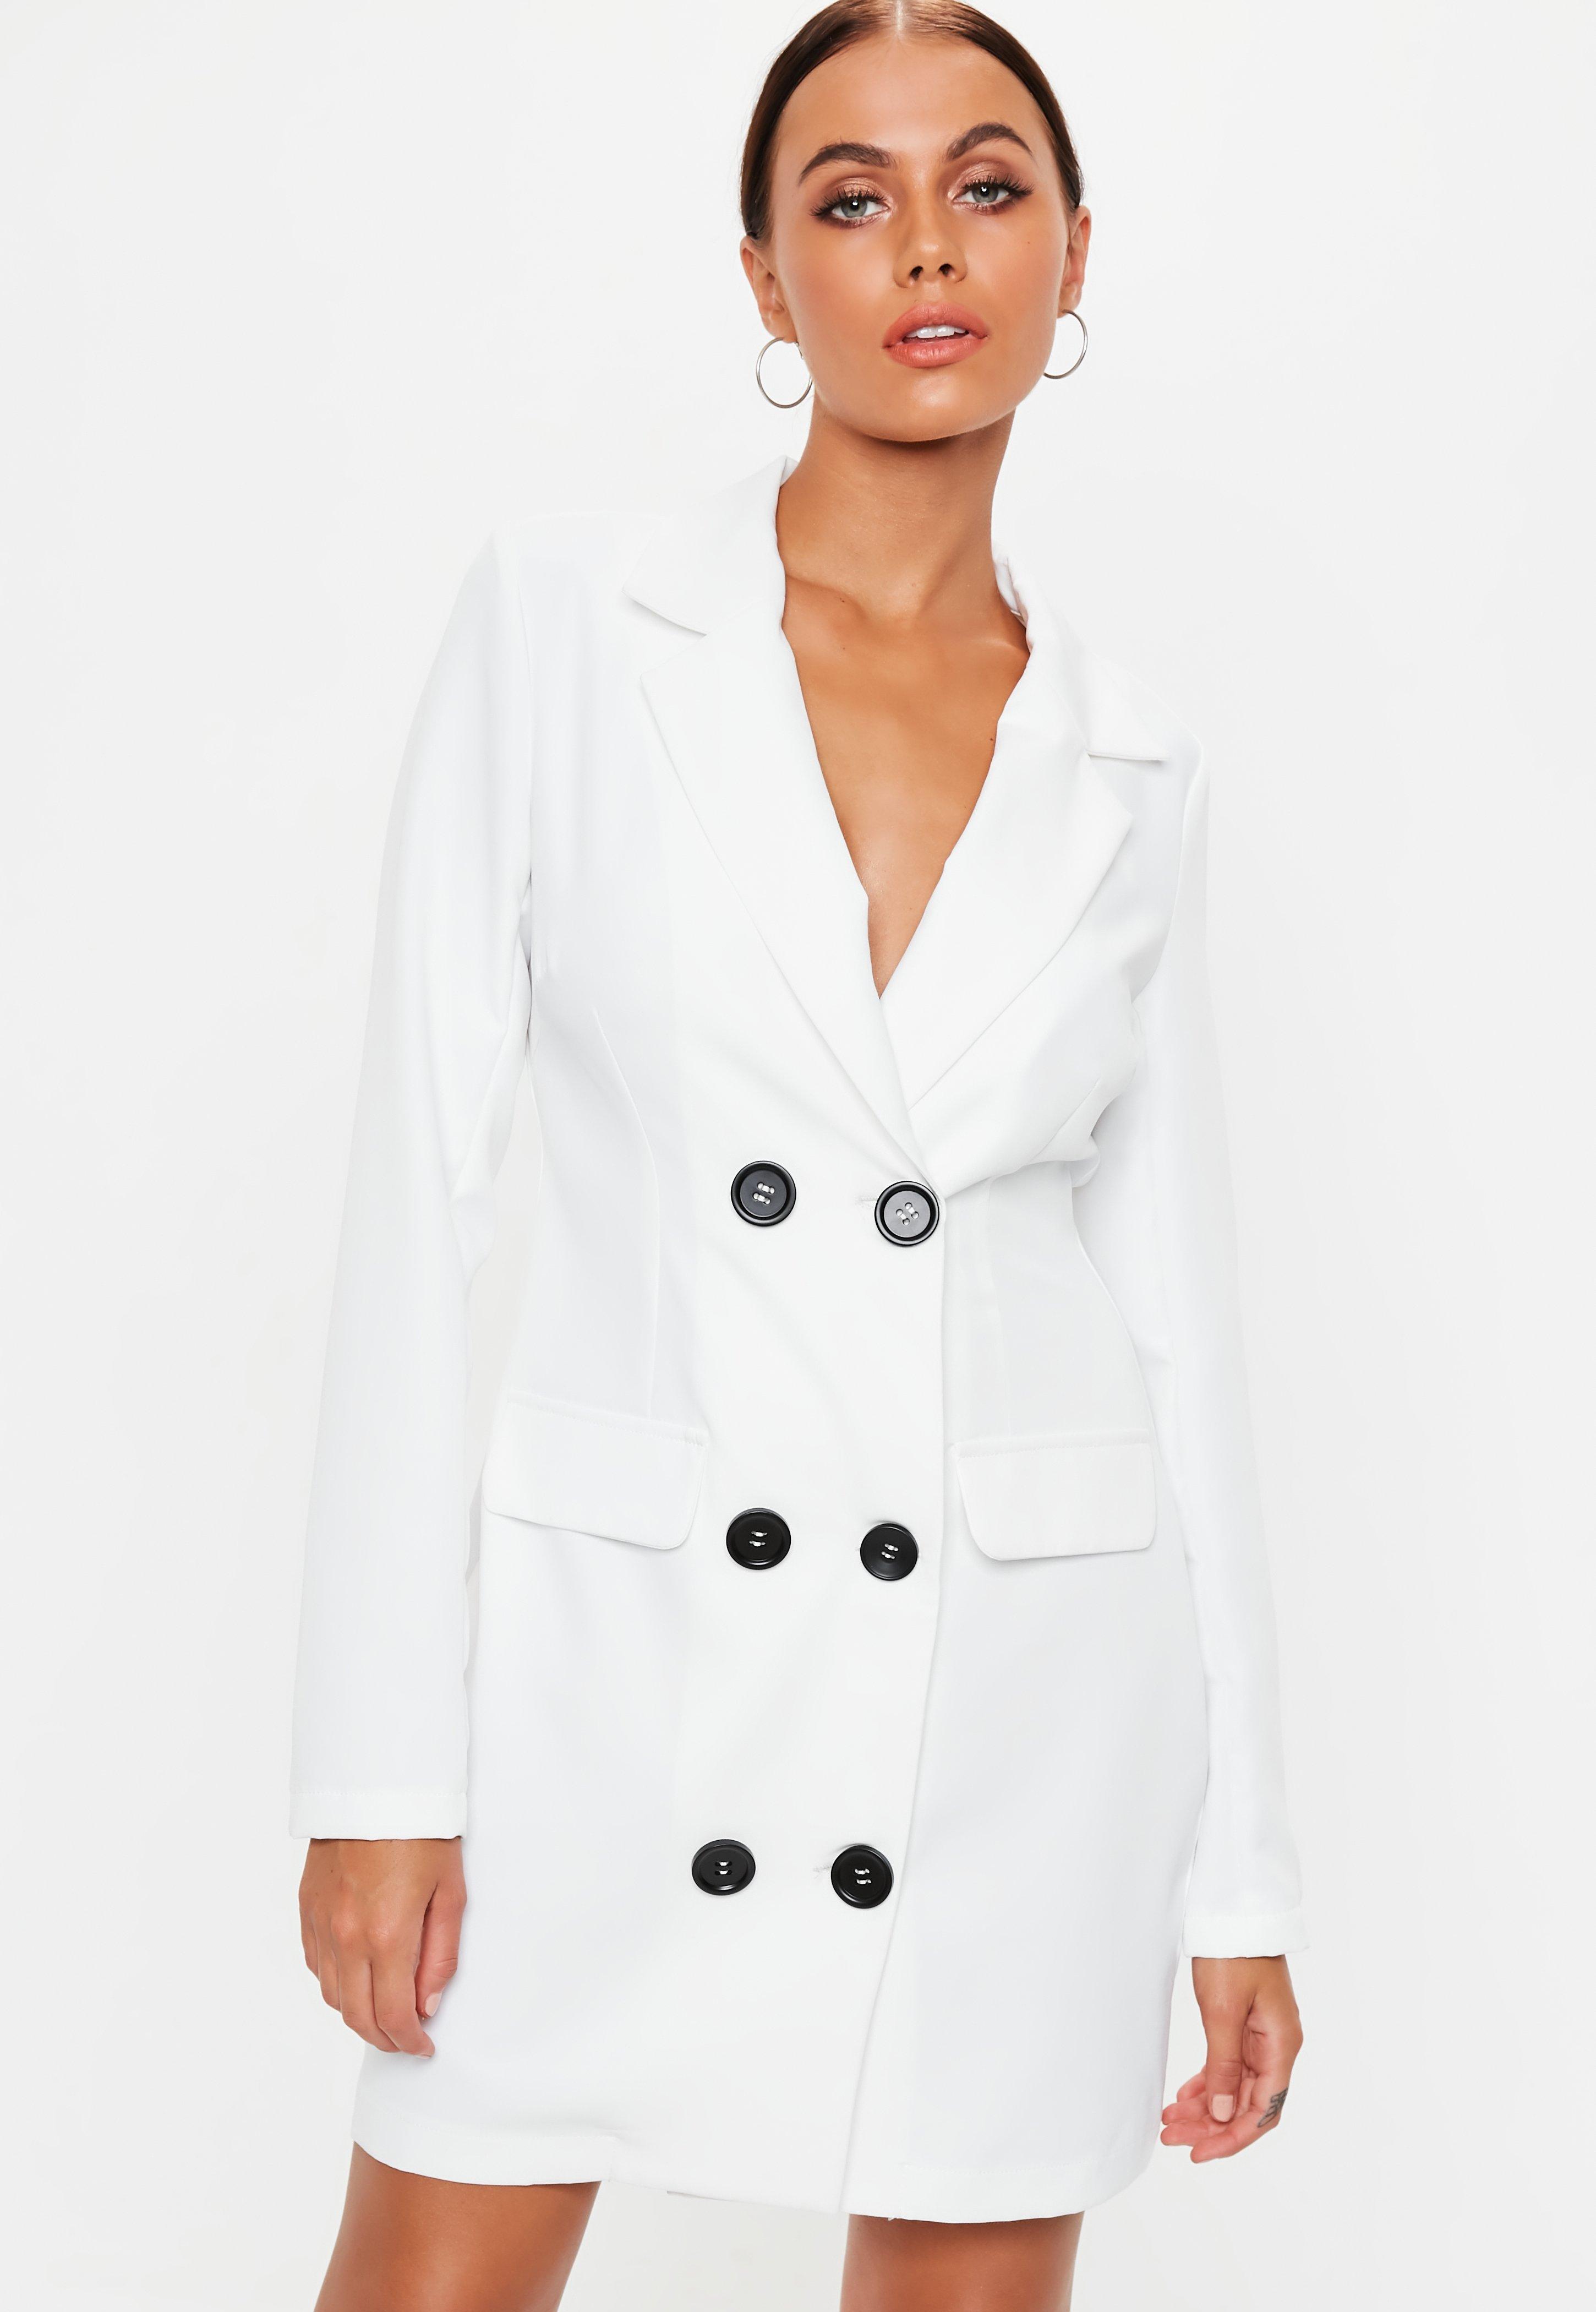 Blazer Vestido Vestido Cruzado Blazer Cruzado Blanco 6wxOq8wPa